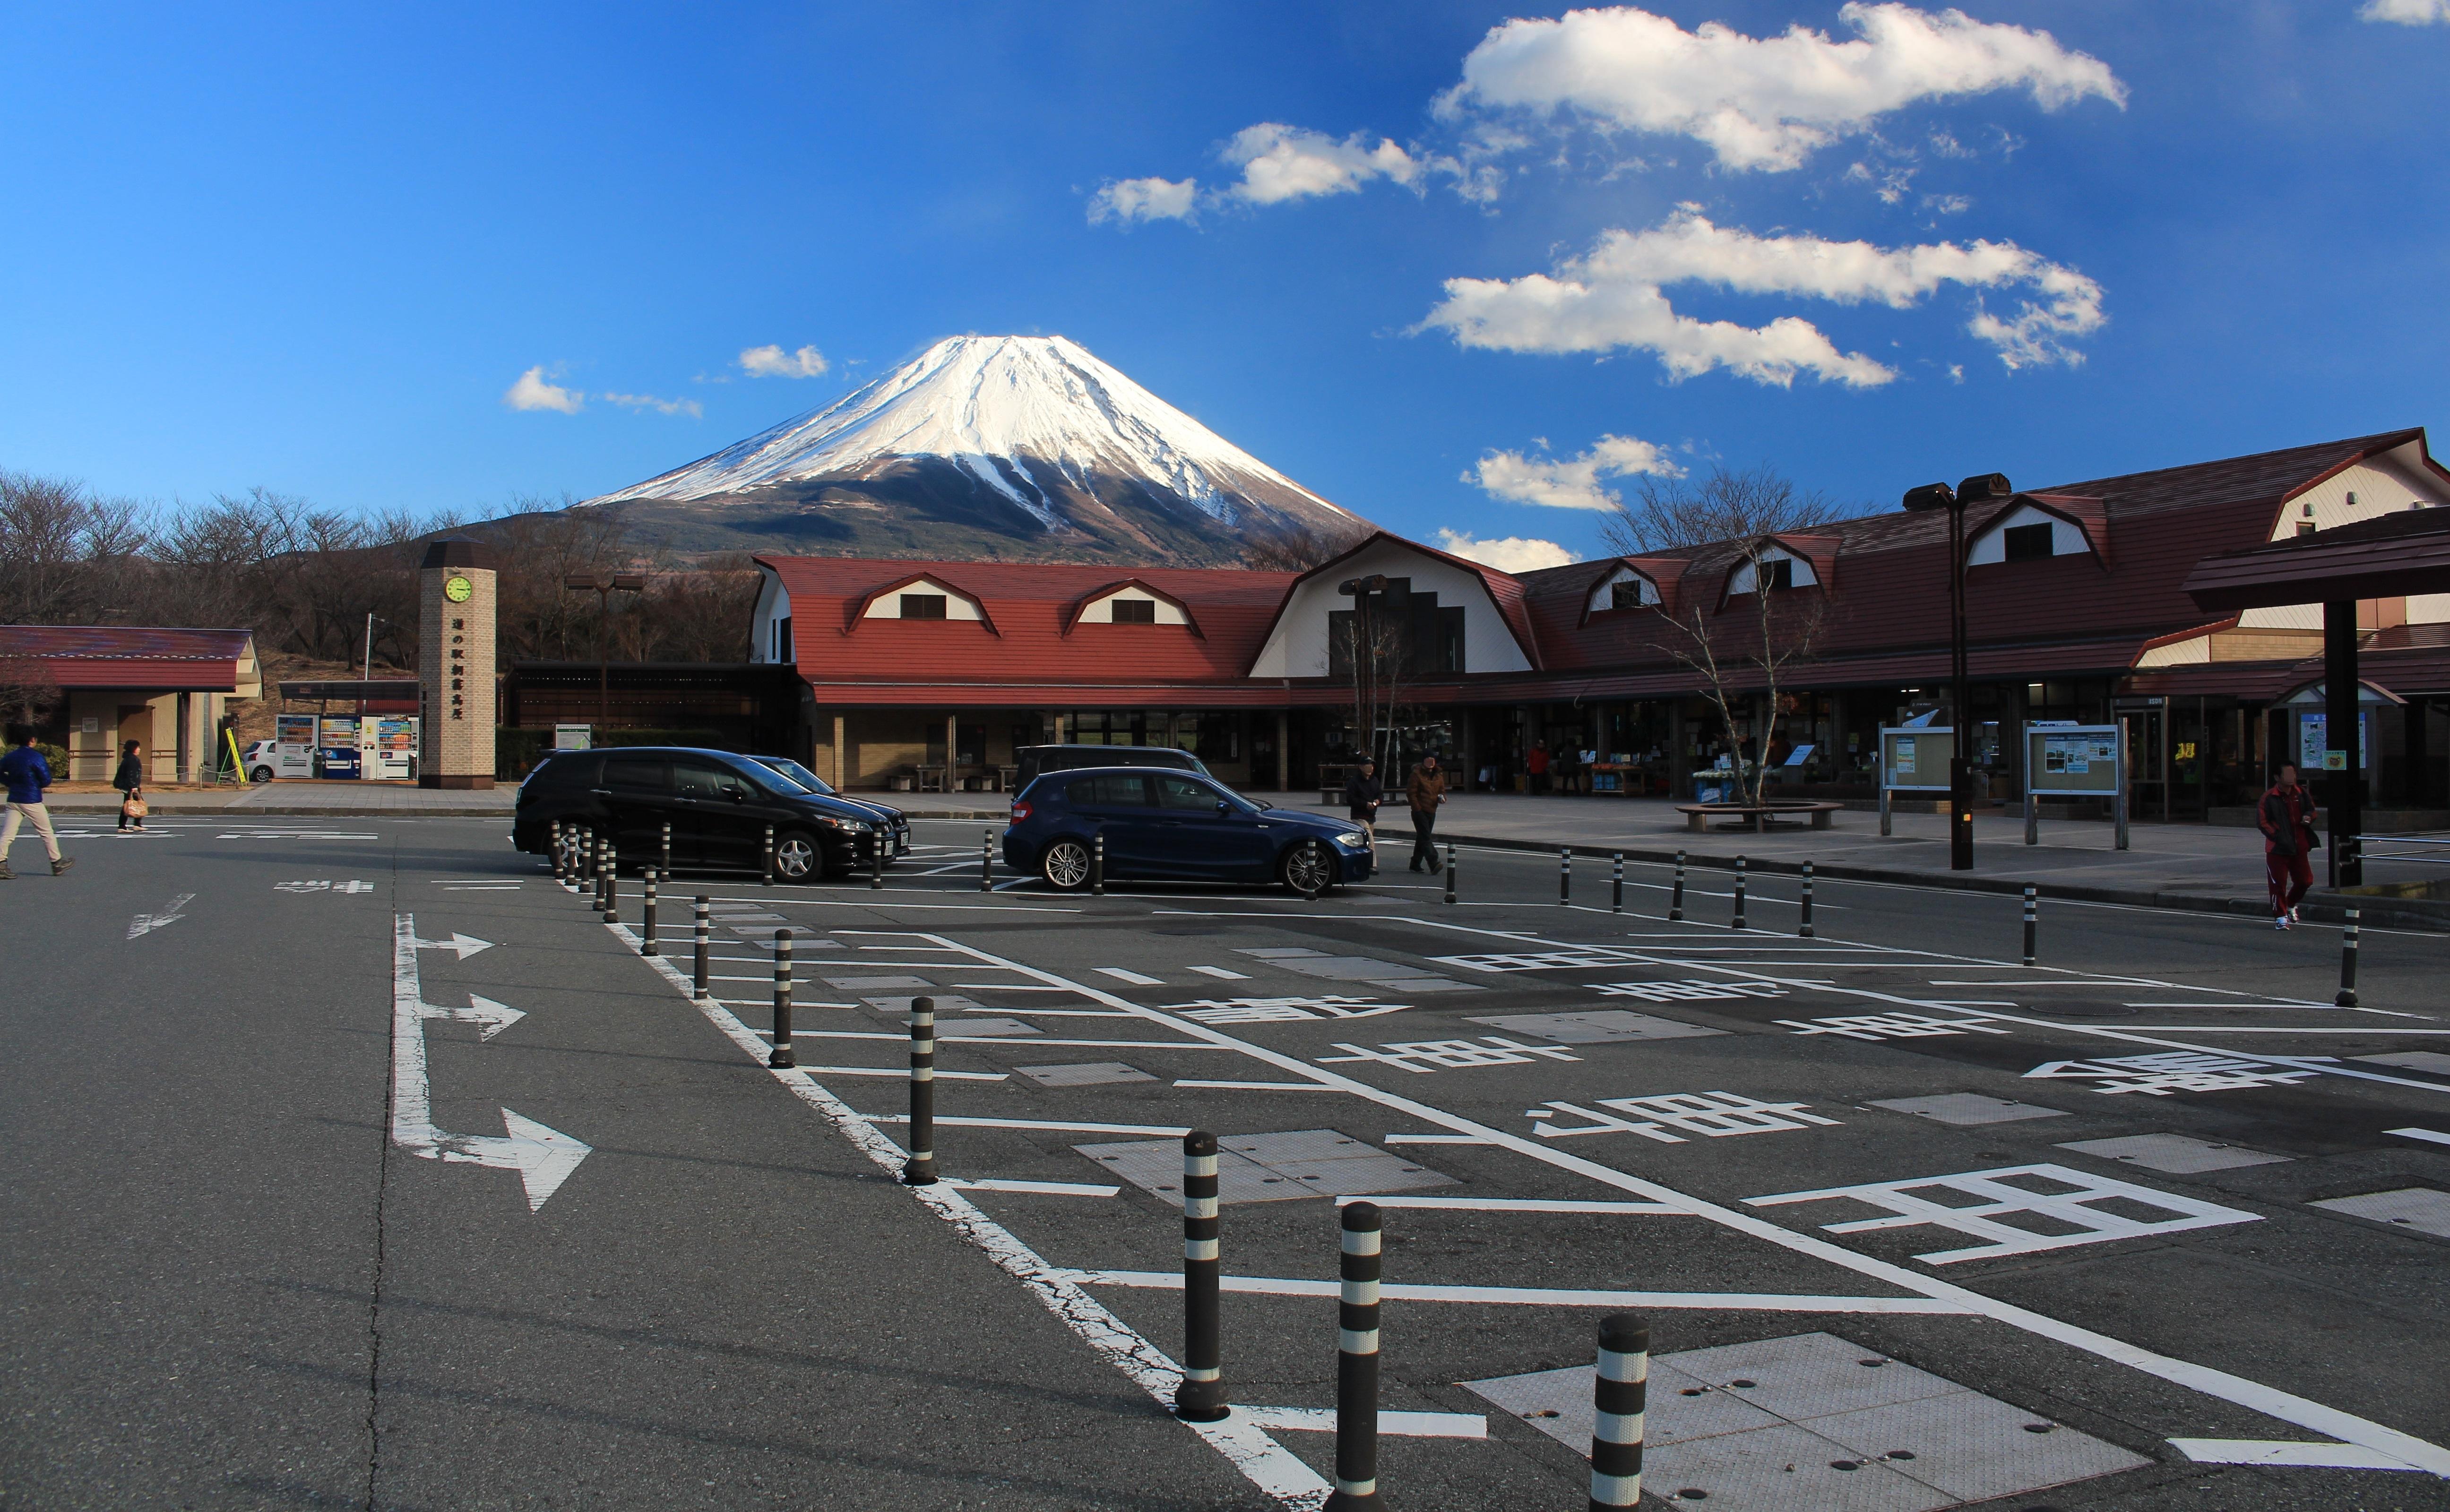 高原 駅 の 朝霧 道